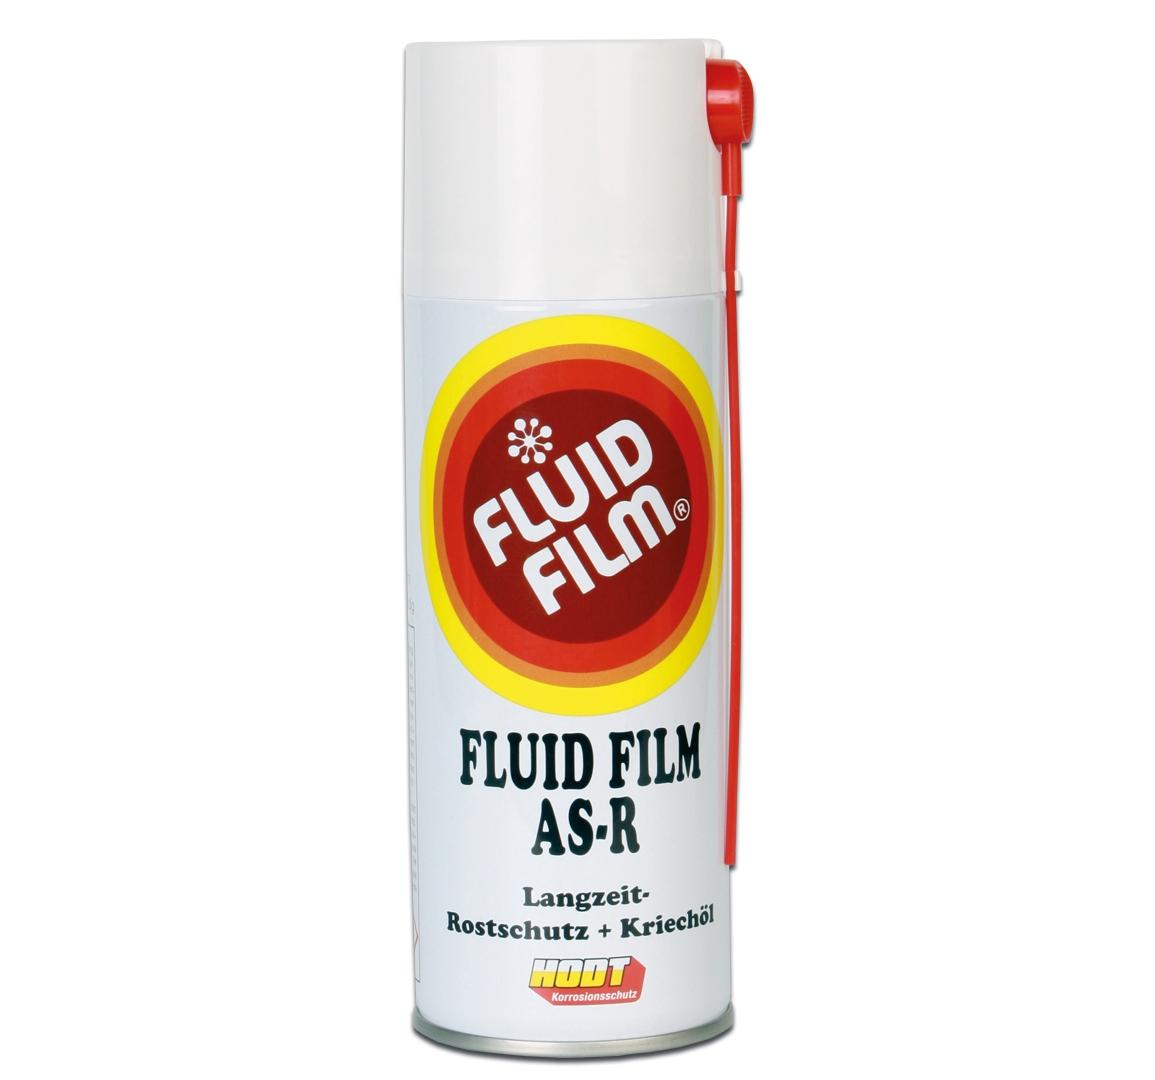 Fluid Film AS-R